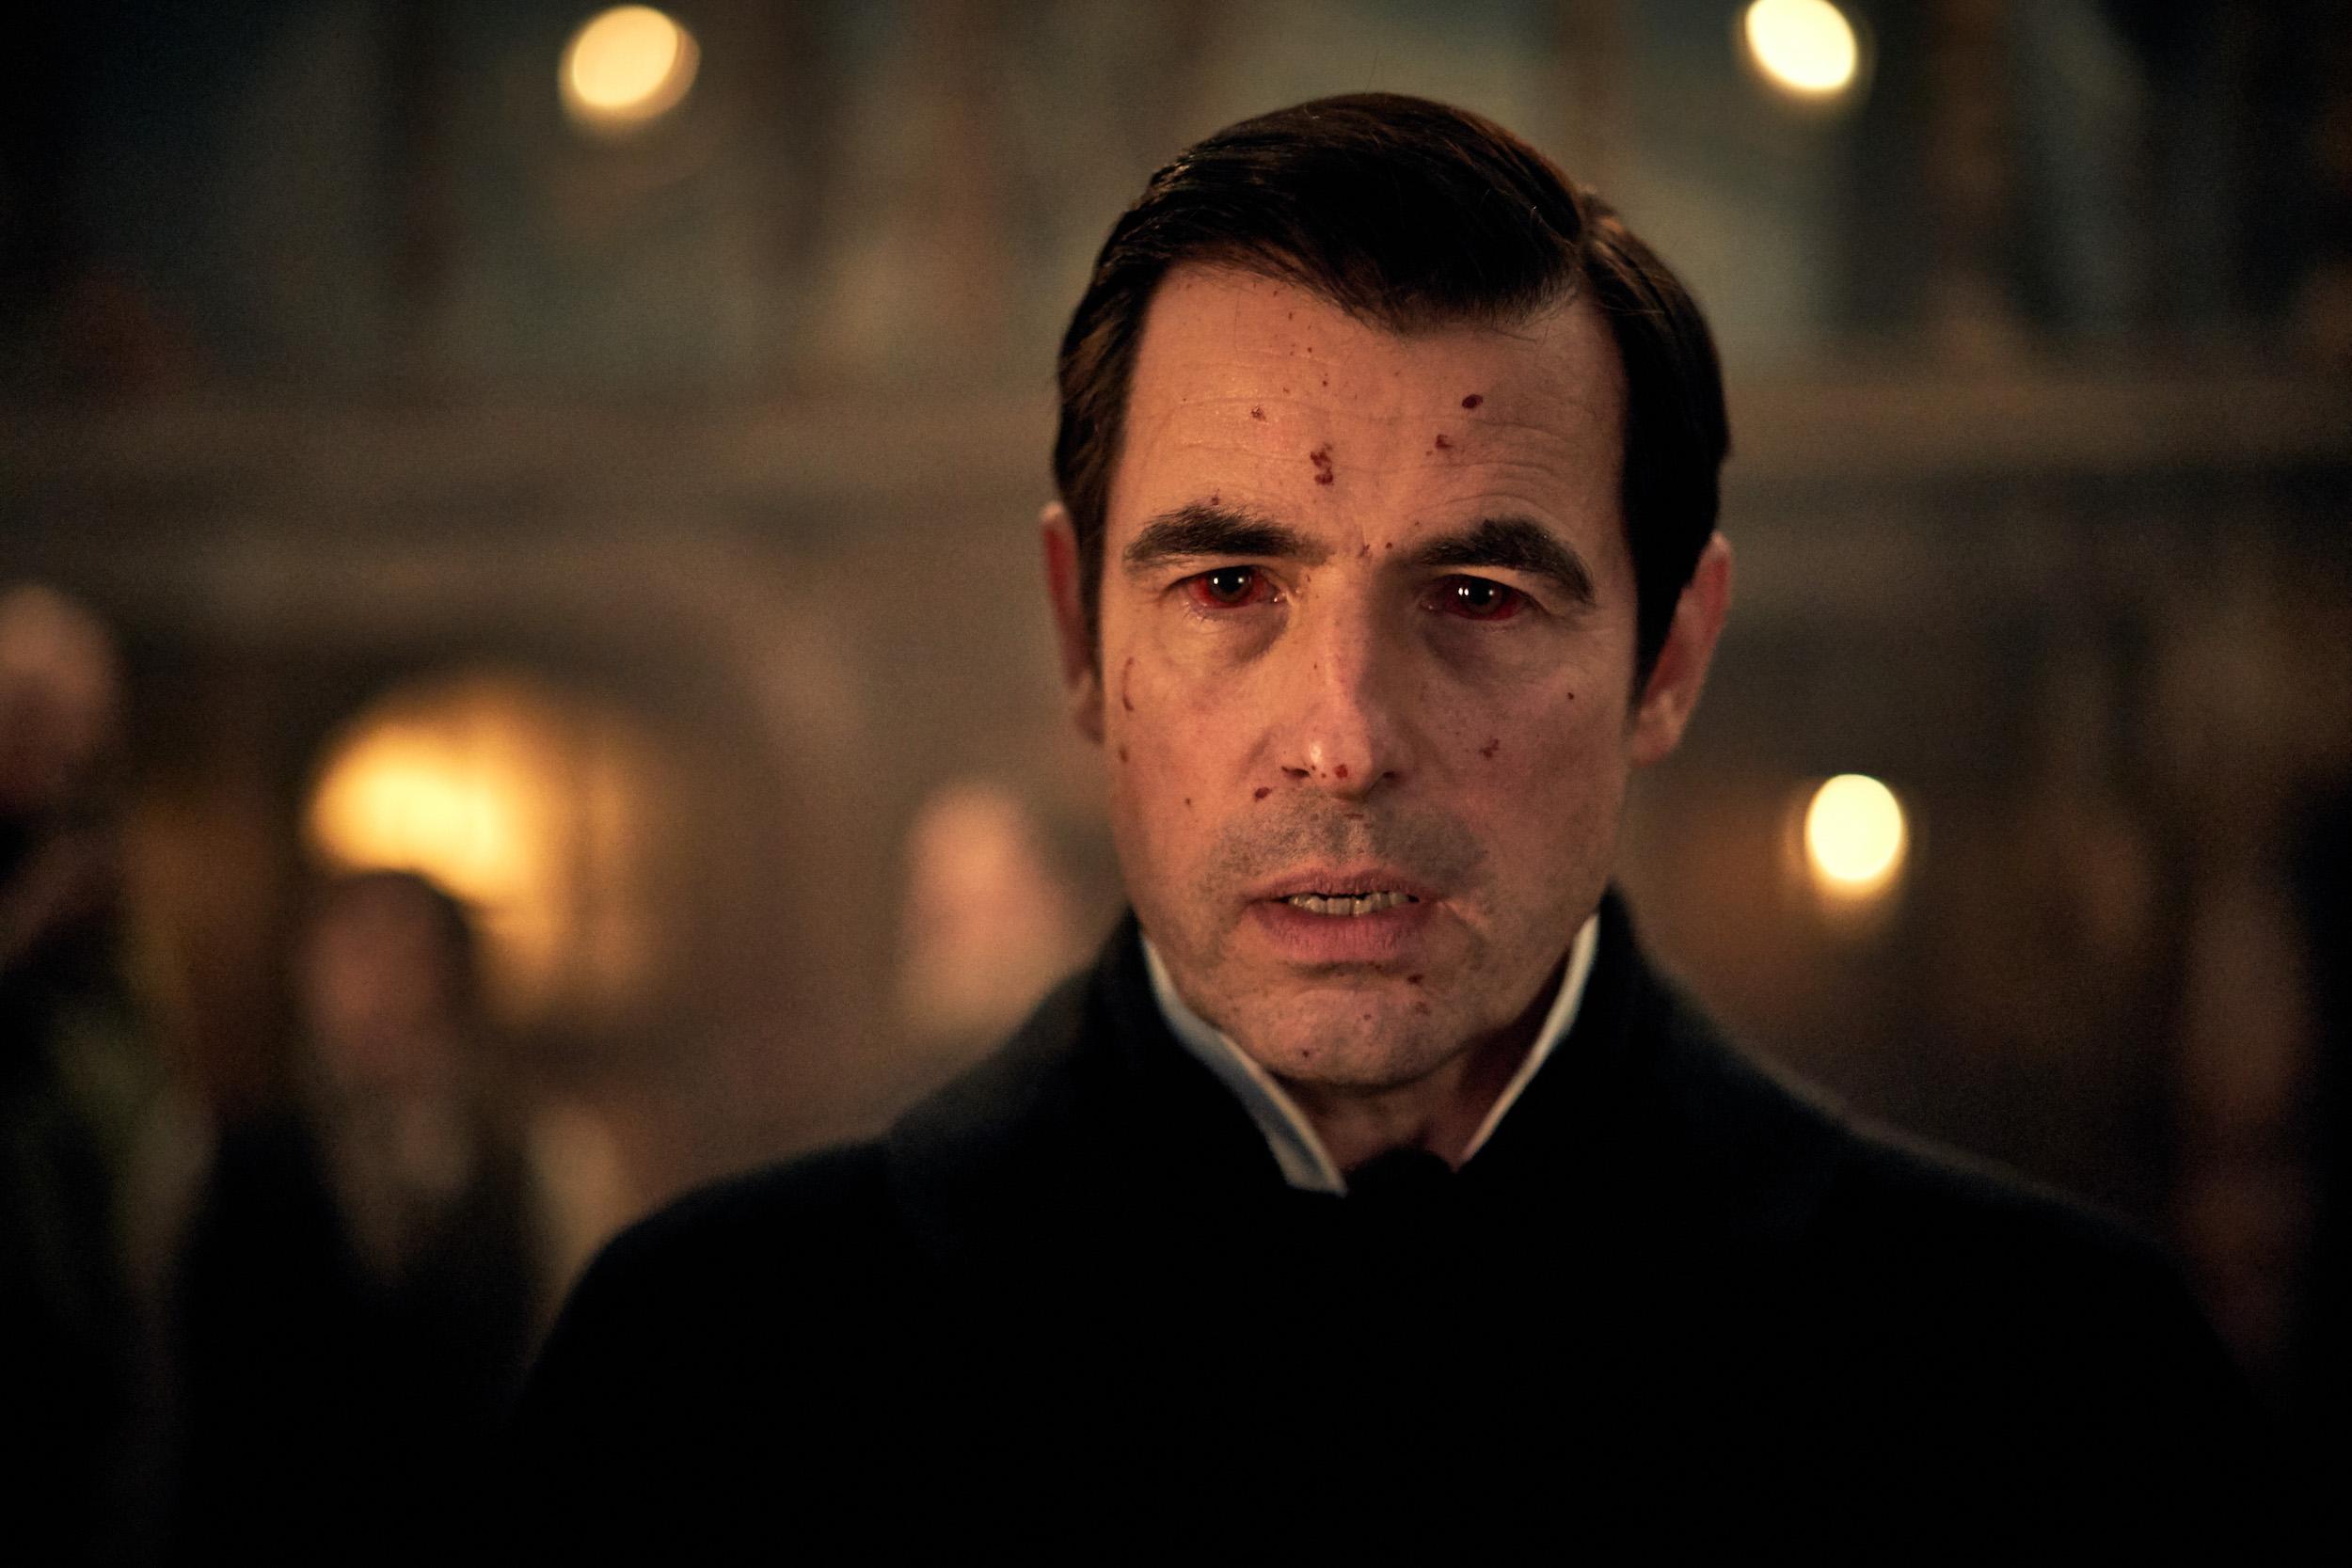 Dracula - episode 2